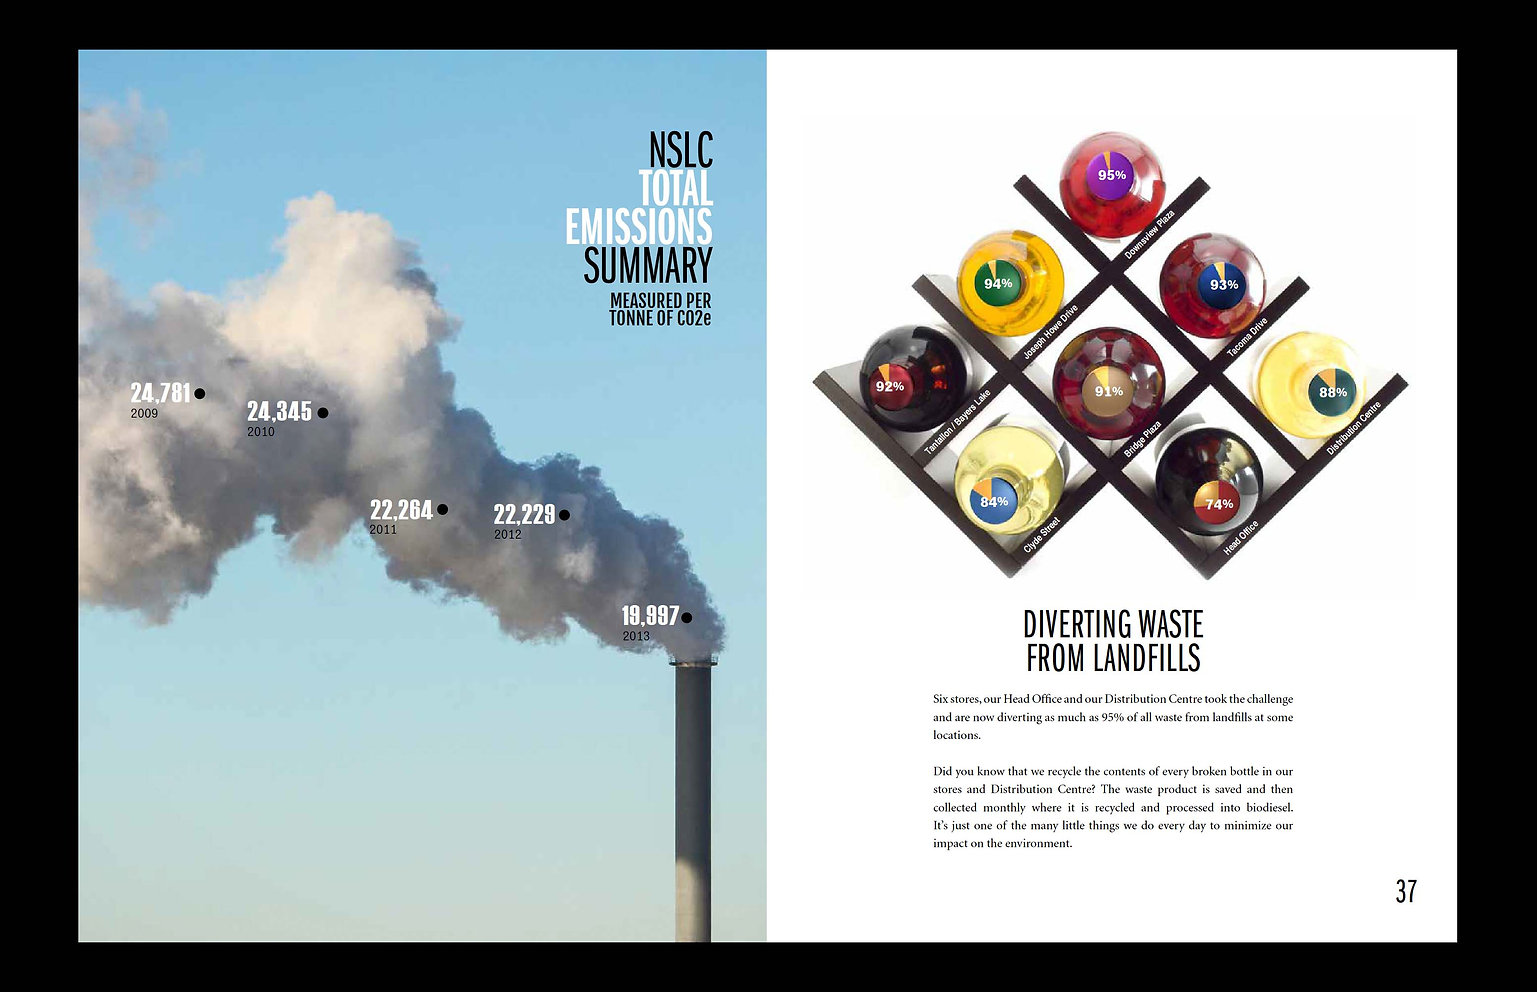 NSLC Annual Report